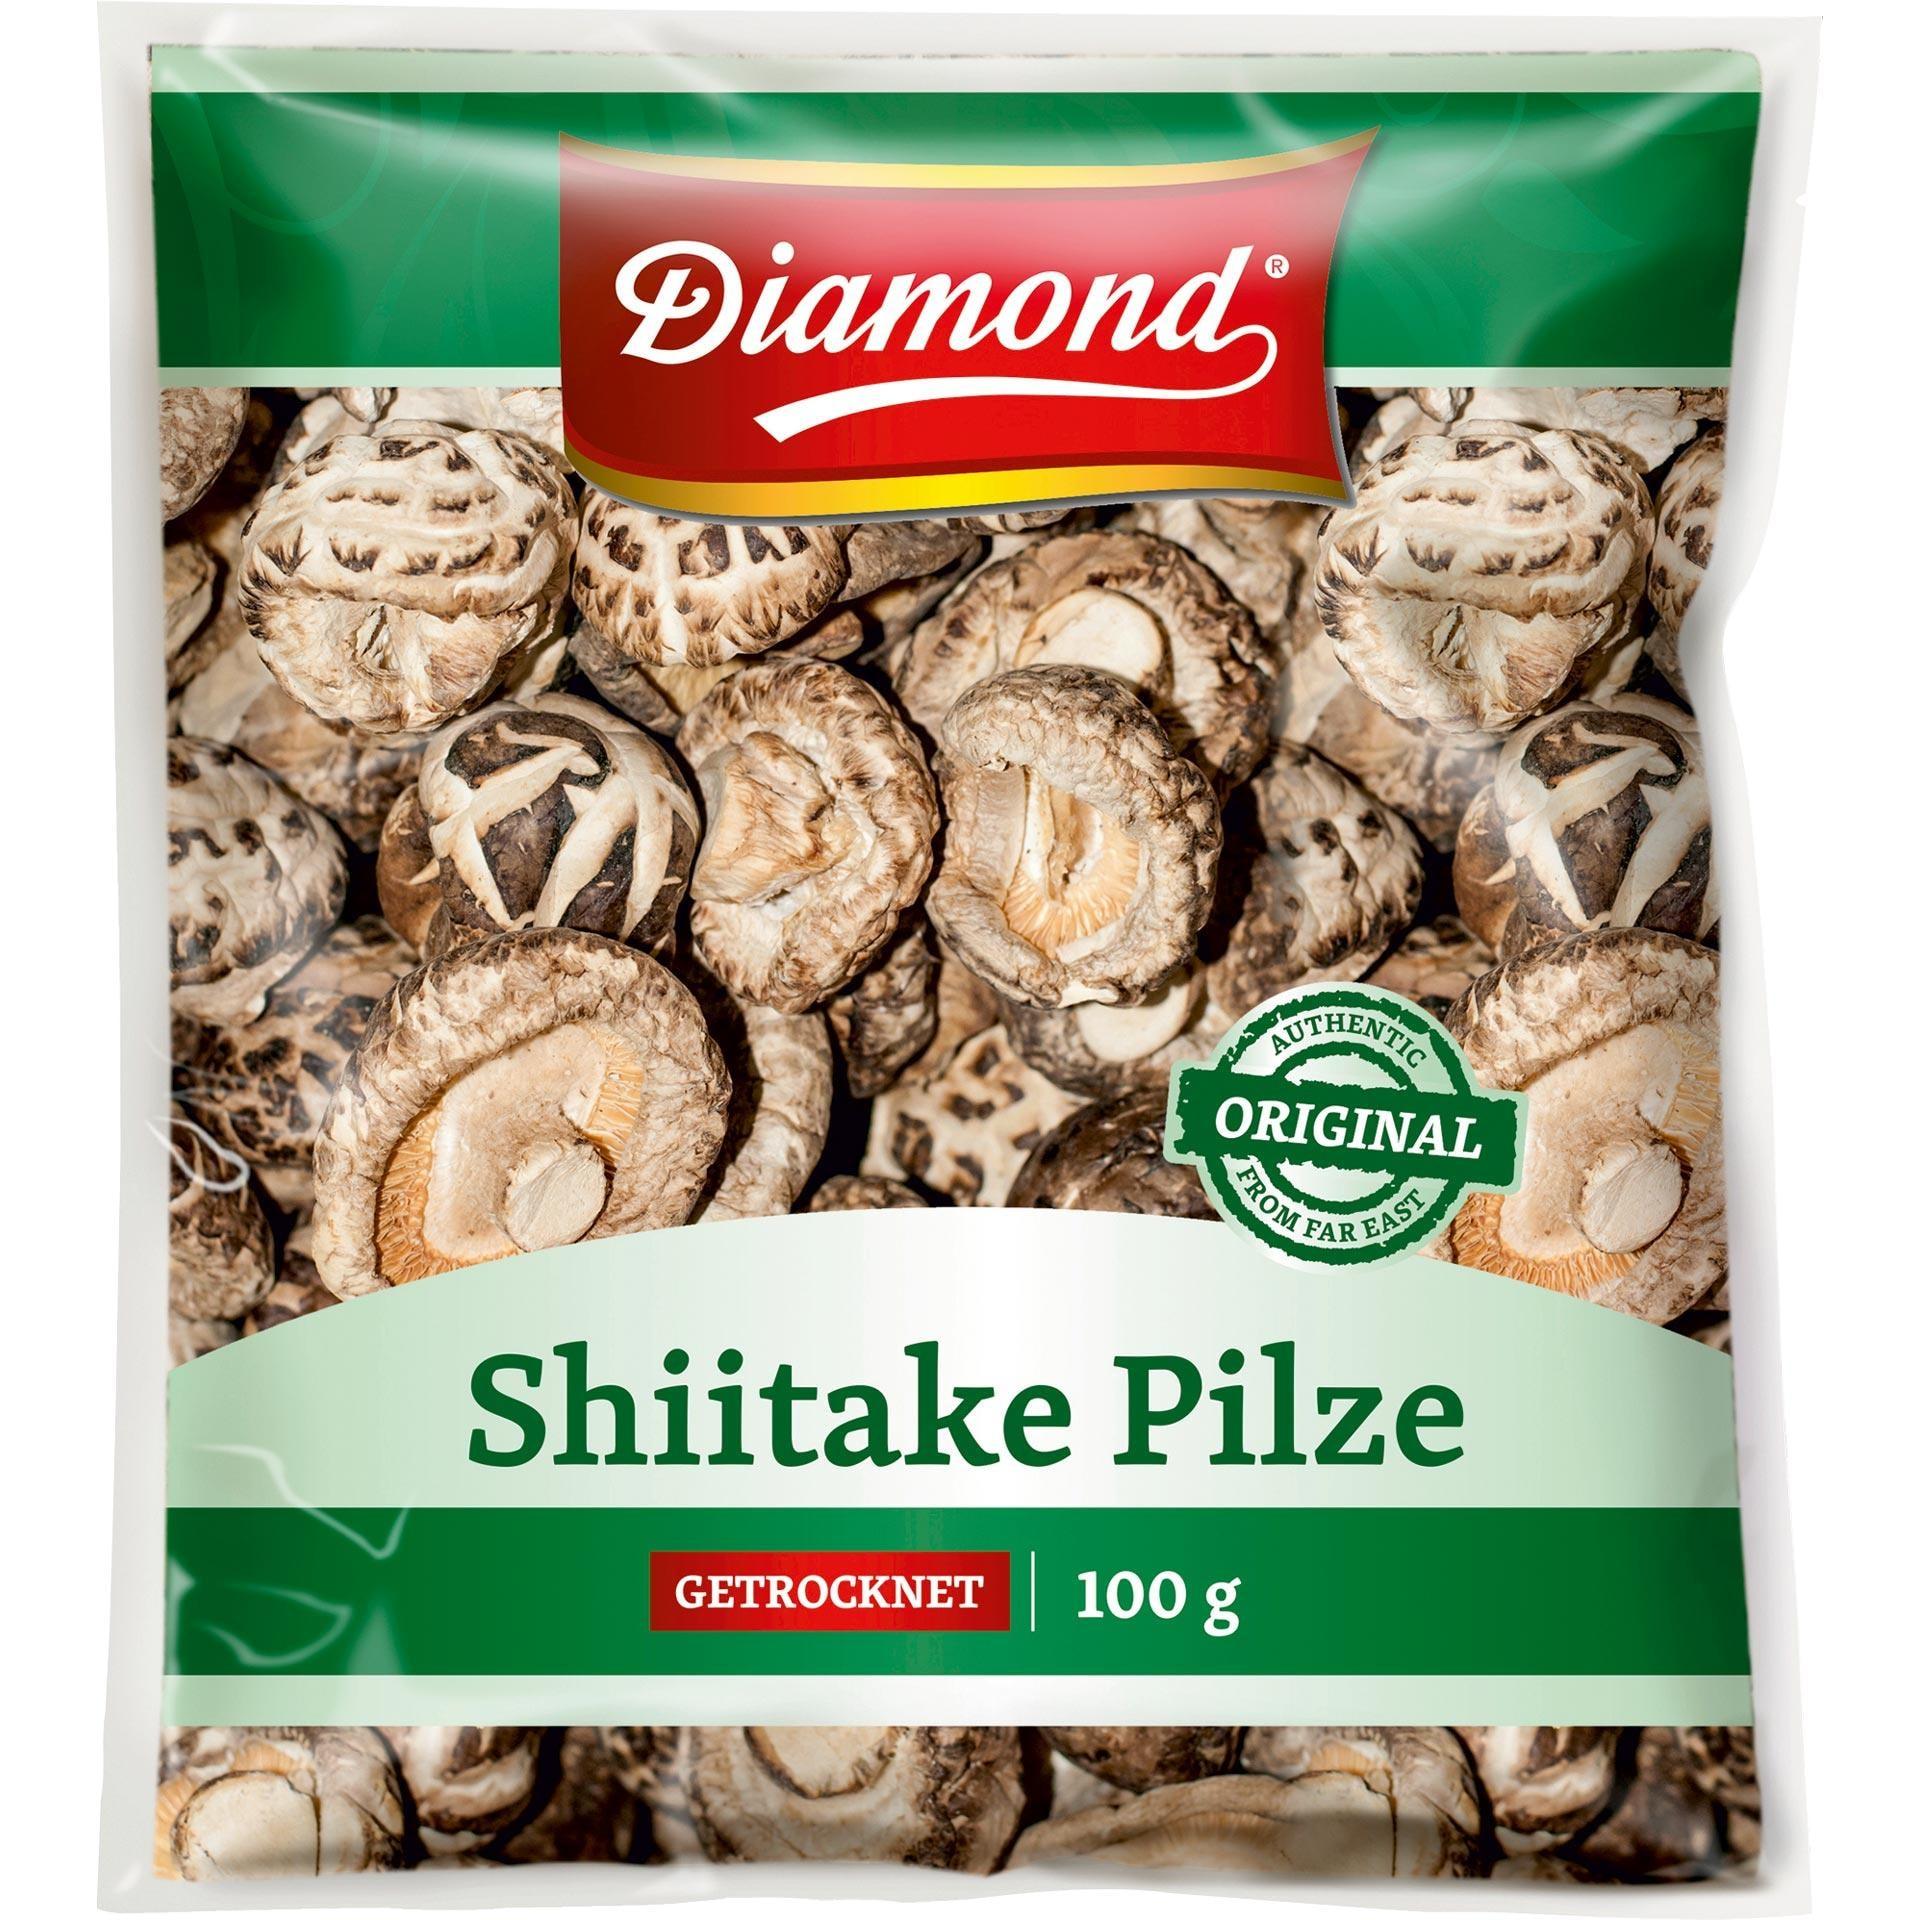 Diamond - Shiitake Pilze Kochzutaten - 100g